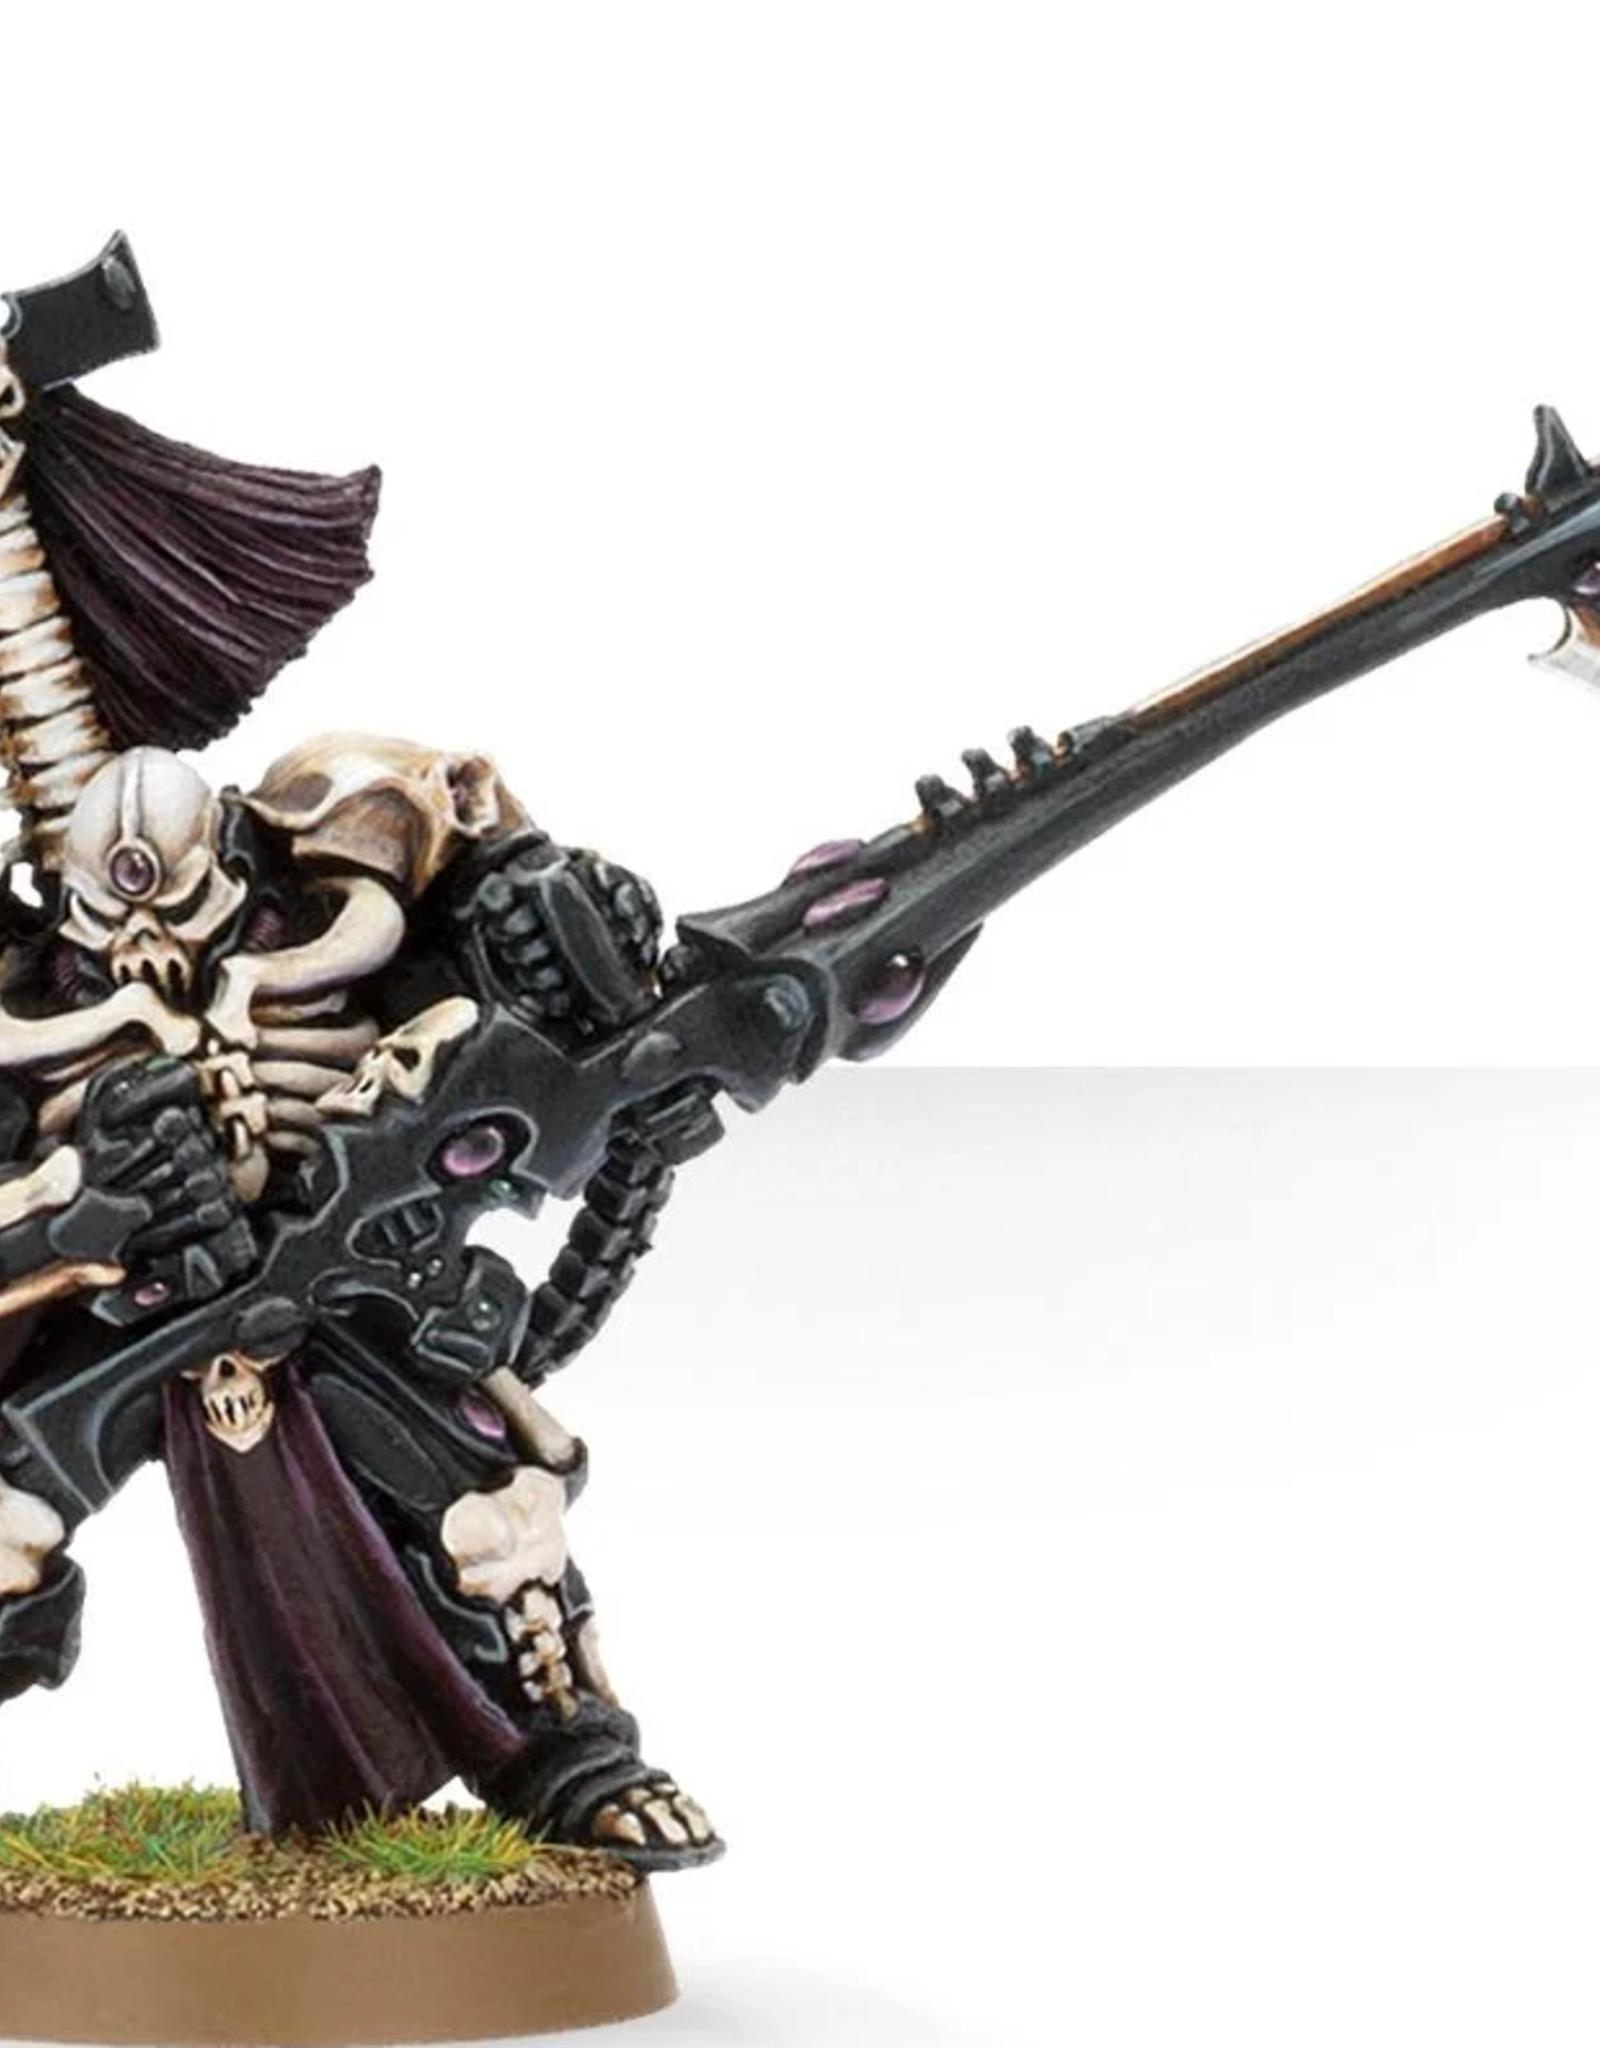 Games Workshop Craftworld: Phoenix Lord Maugan Ra